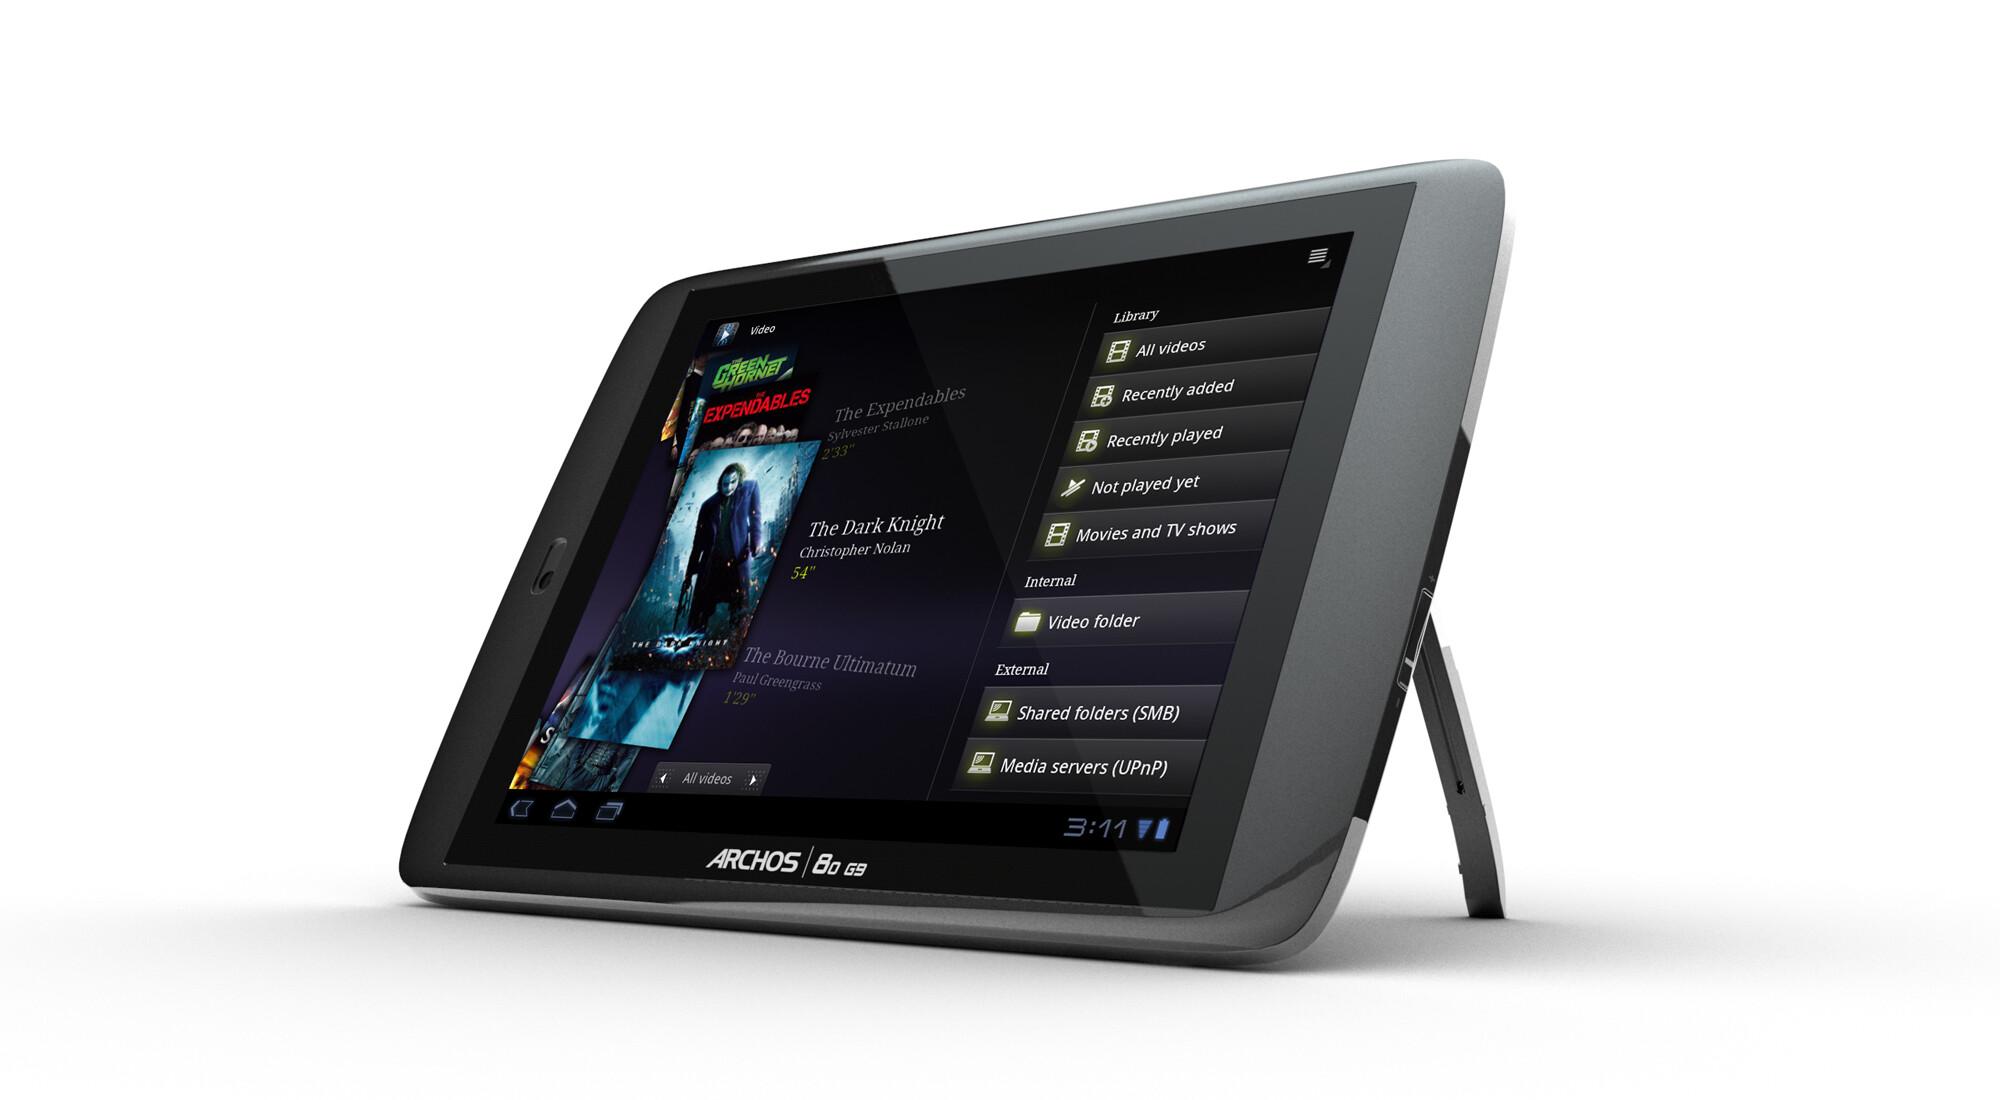 ARCHOS 80 XS Tablet Windows 8